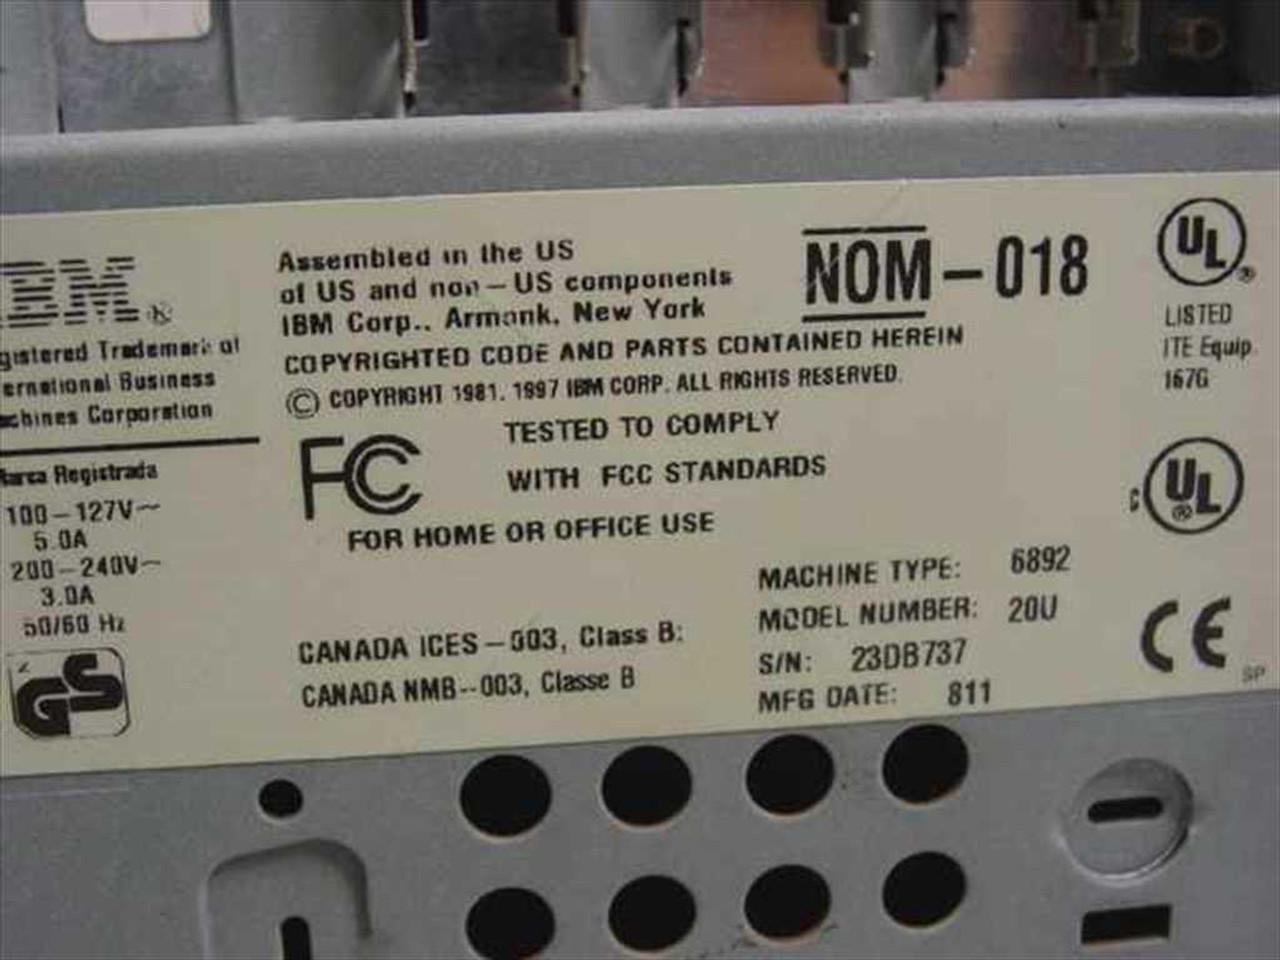 IBM PC CAMERA ICESNMB-003 WINDOWS 8 X64 DRIVER